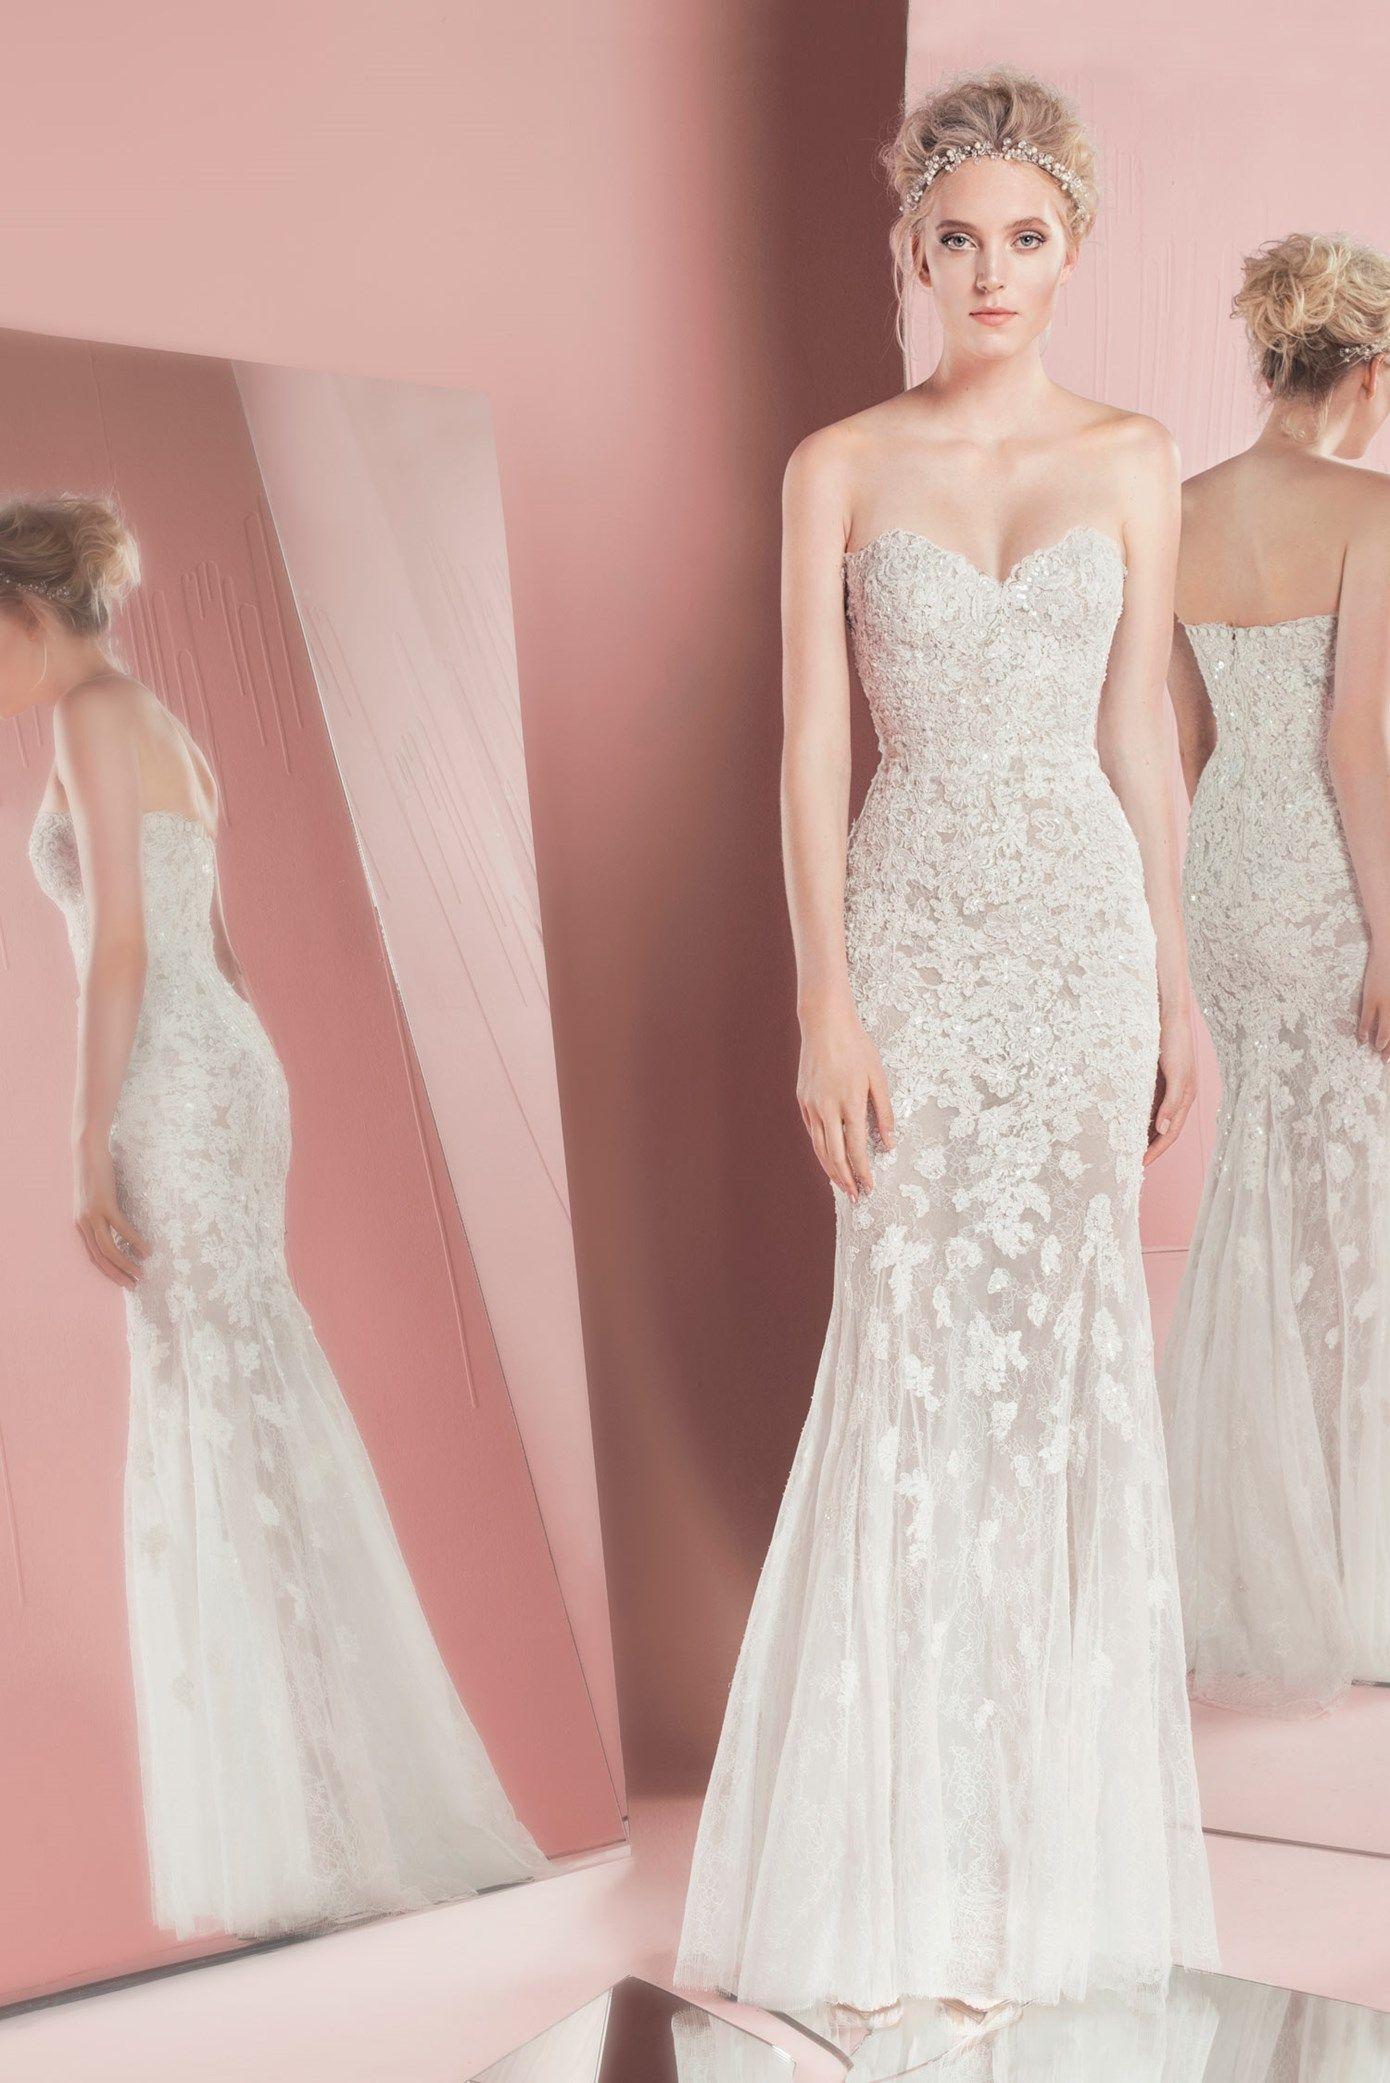 Bridal SS 16 | Wedding Gowns | Pinterest | Bodas mexicanas ...